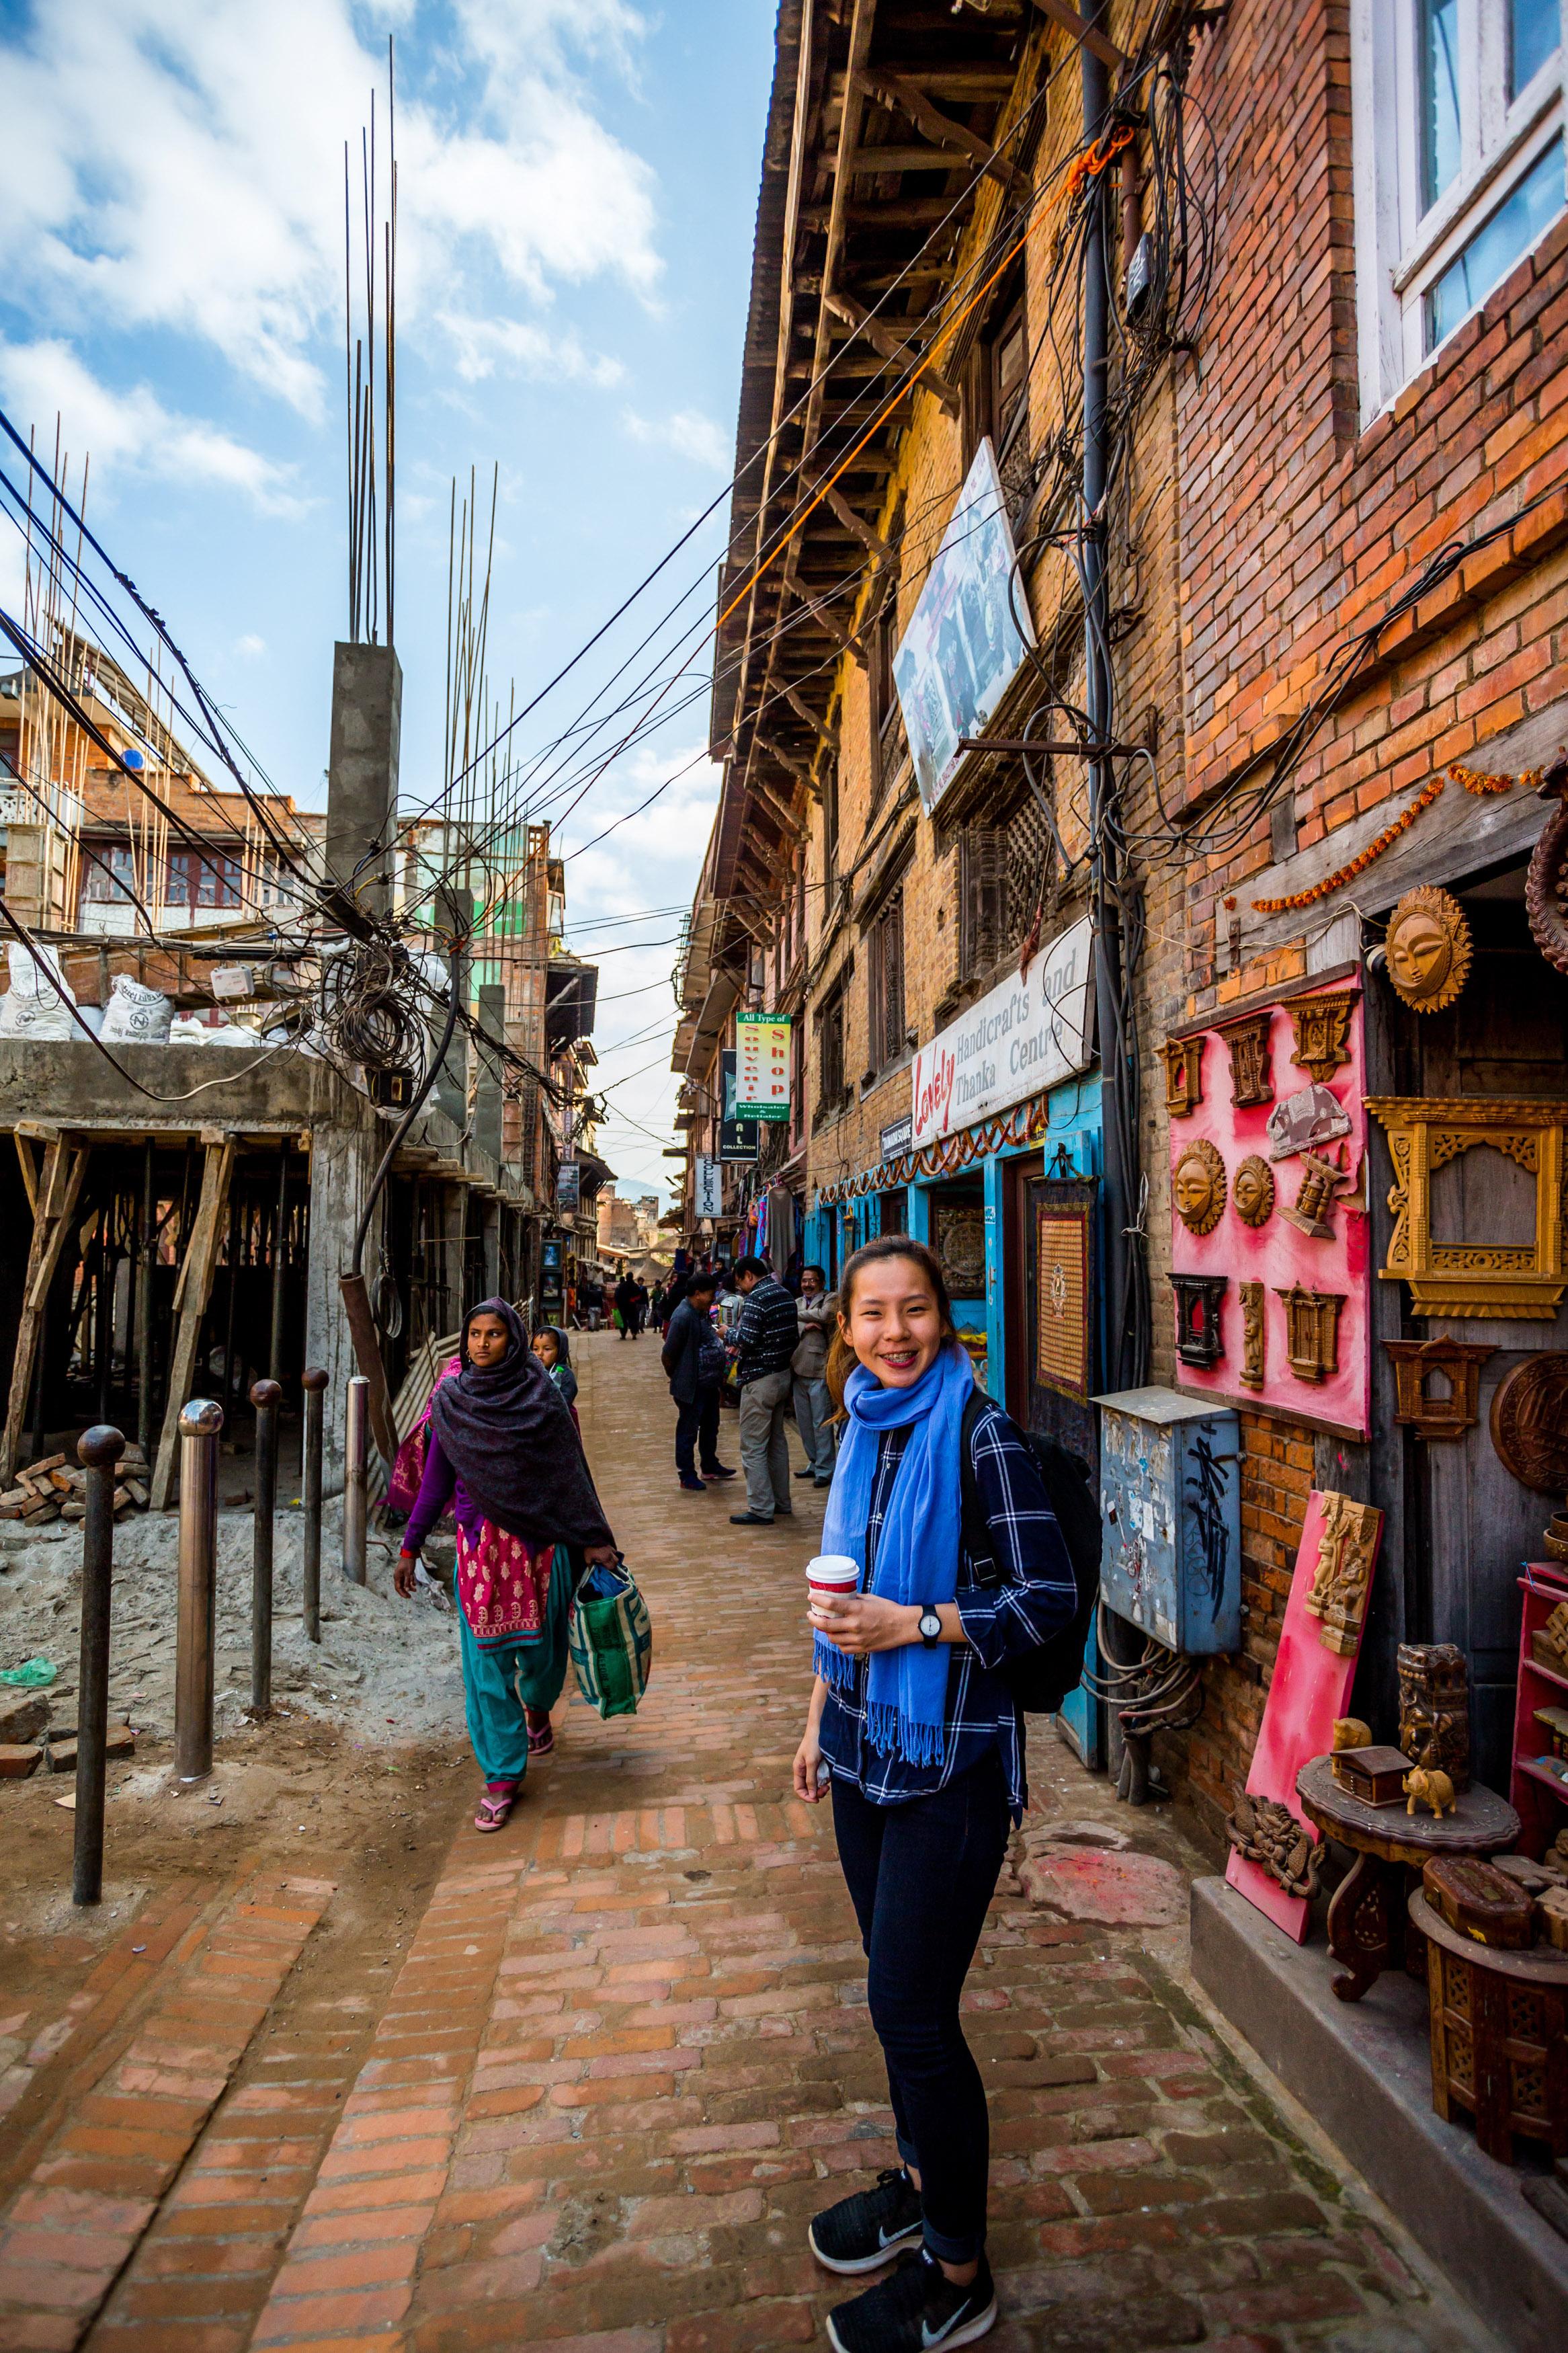 Somewhere in Bhaktapur